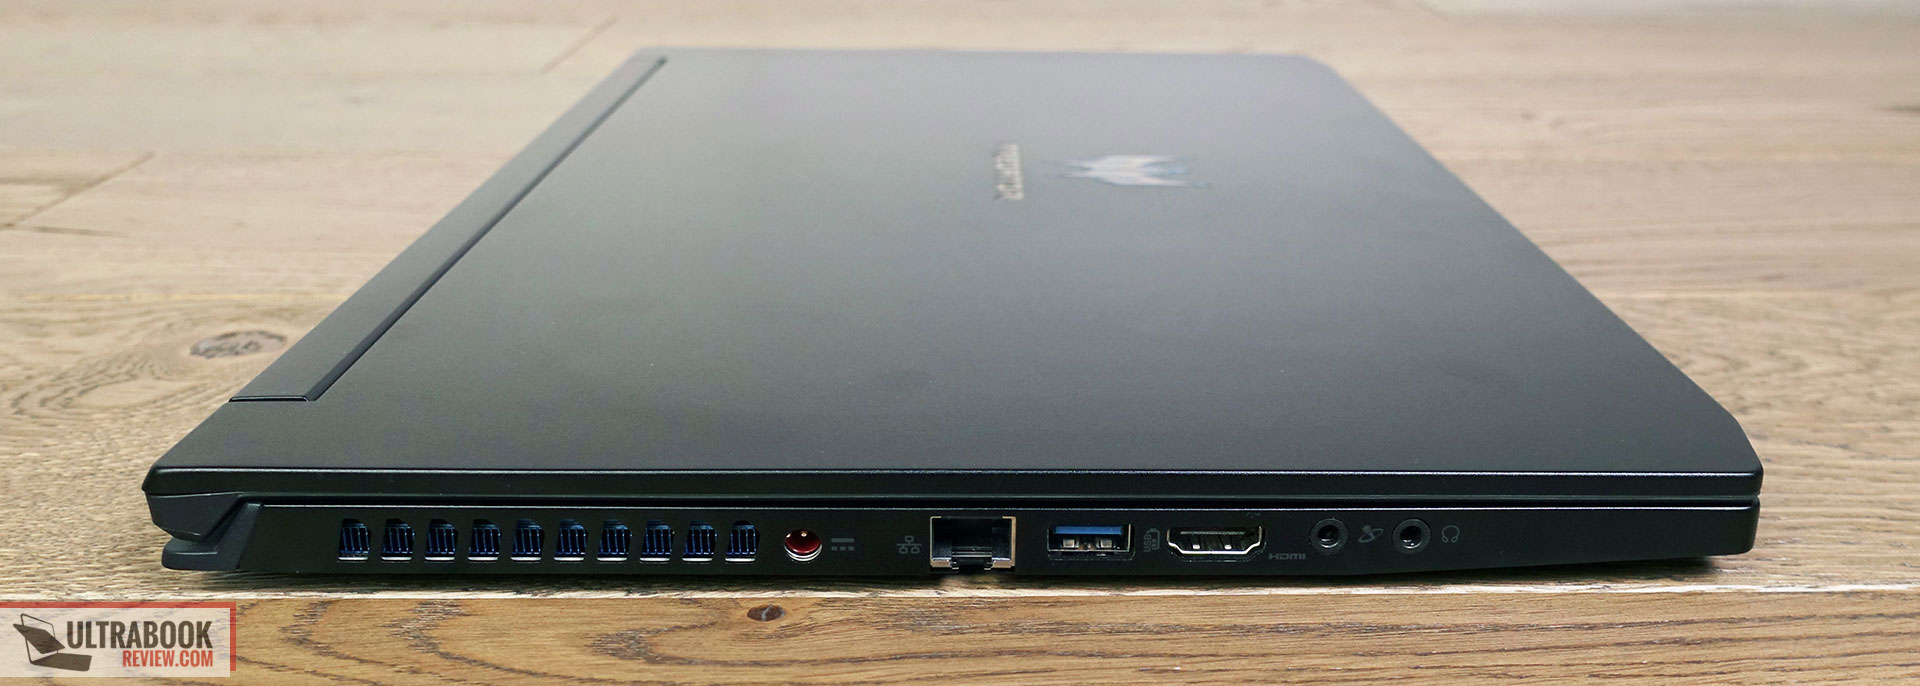 Acer Predator Triton 500 review (i7-8750H, RTX 2080 Max-Q